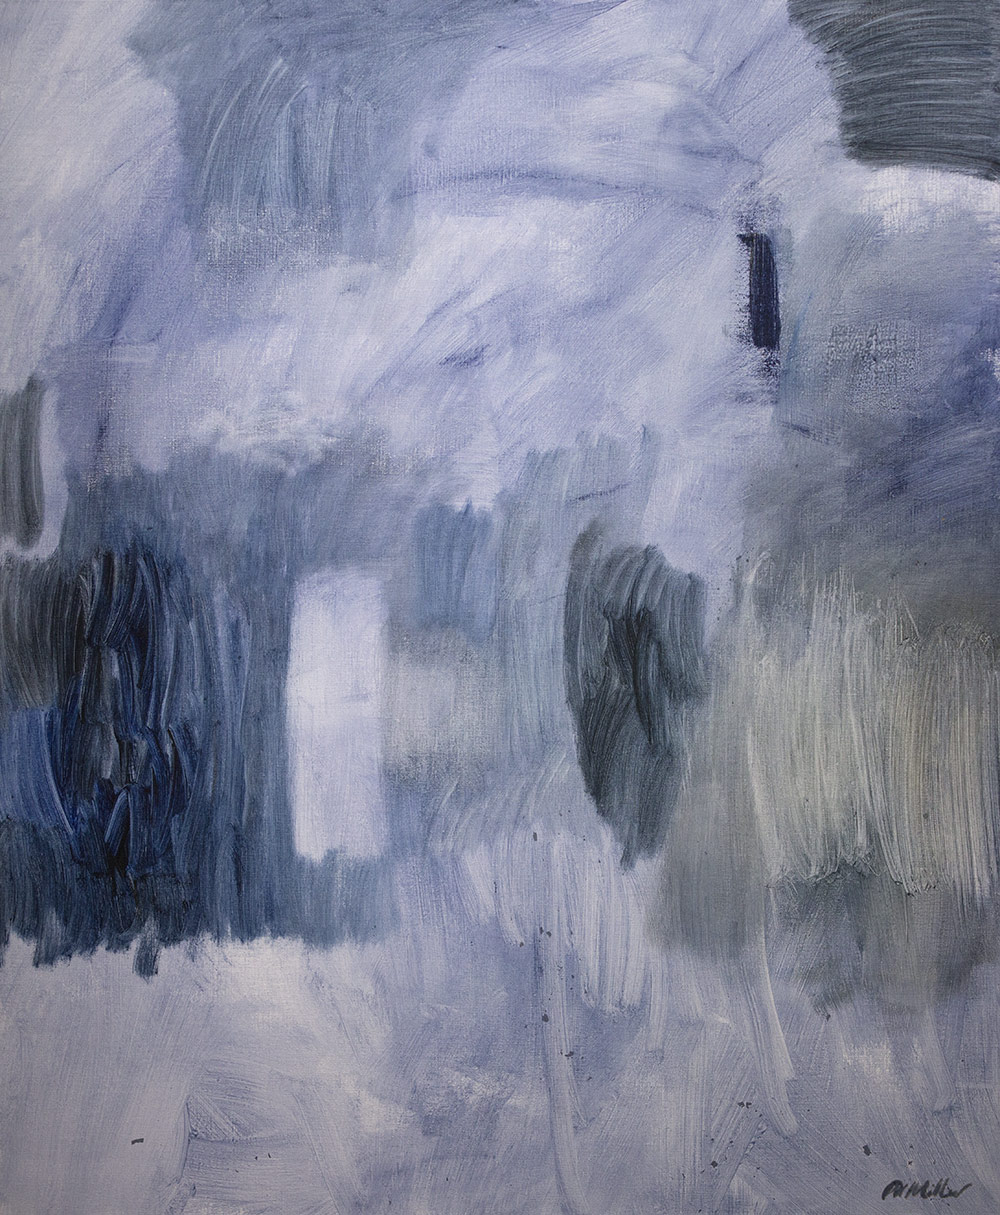 Transcendence  Acrylic on linen  90 x 105cm